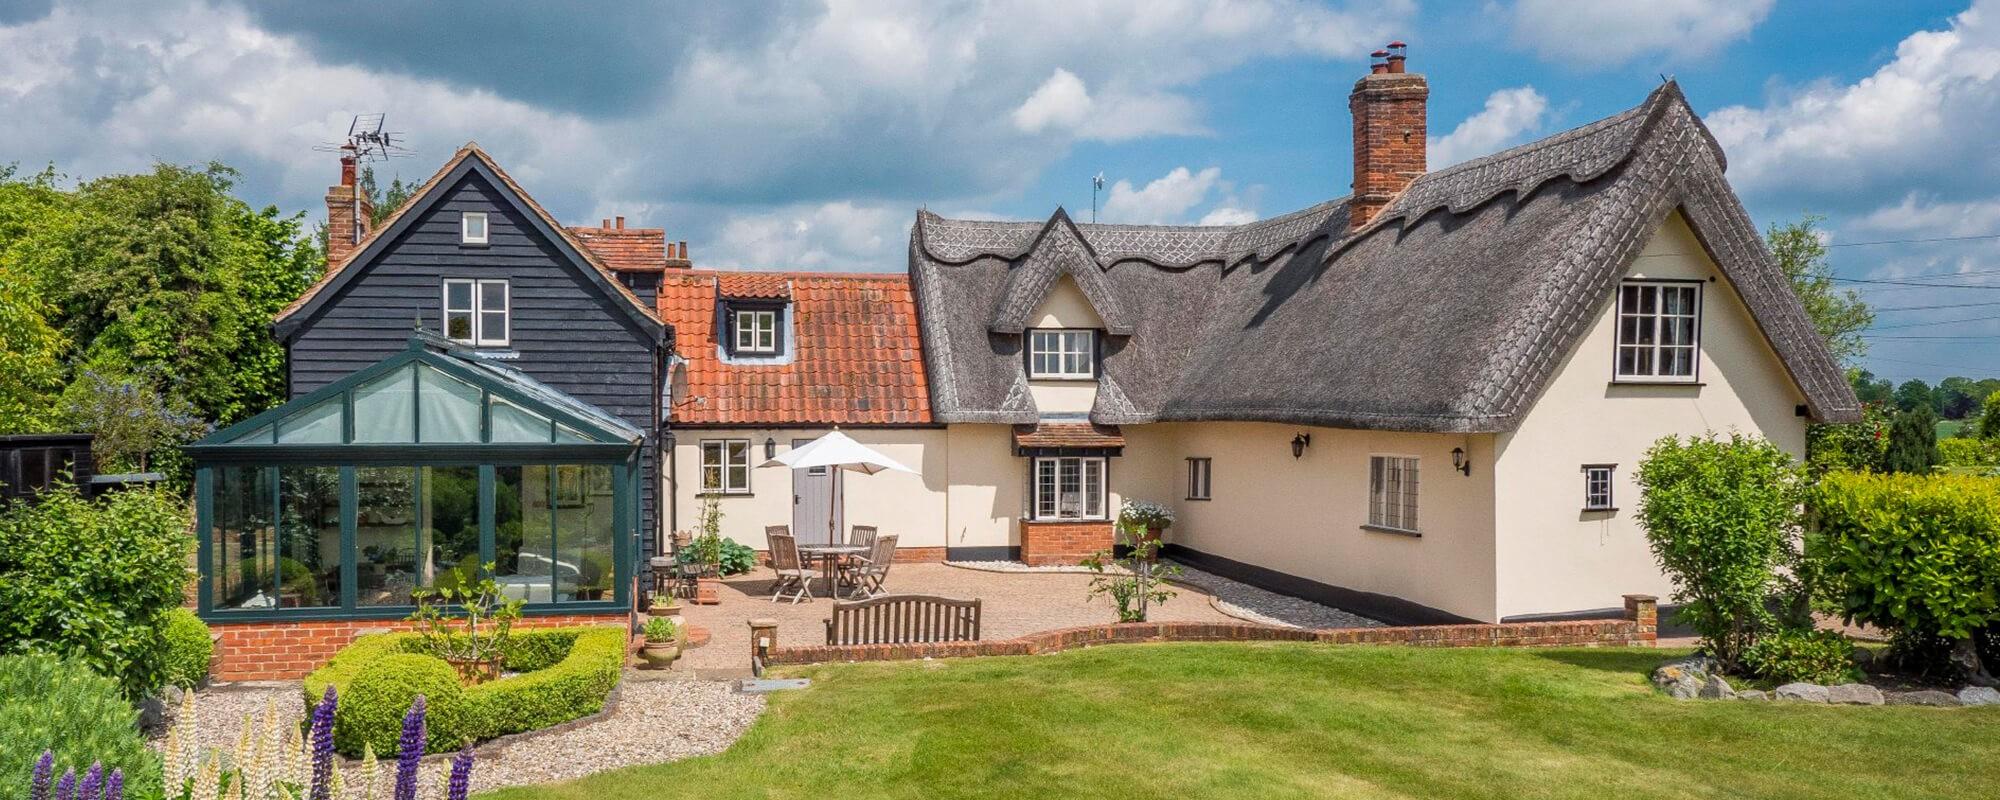 David Burr Houses